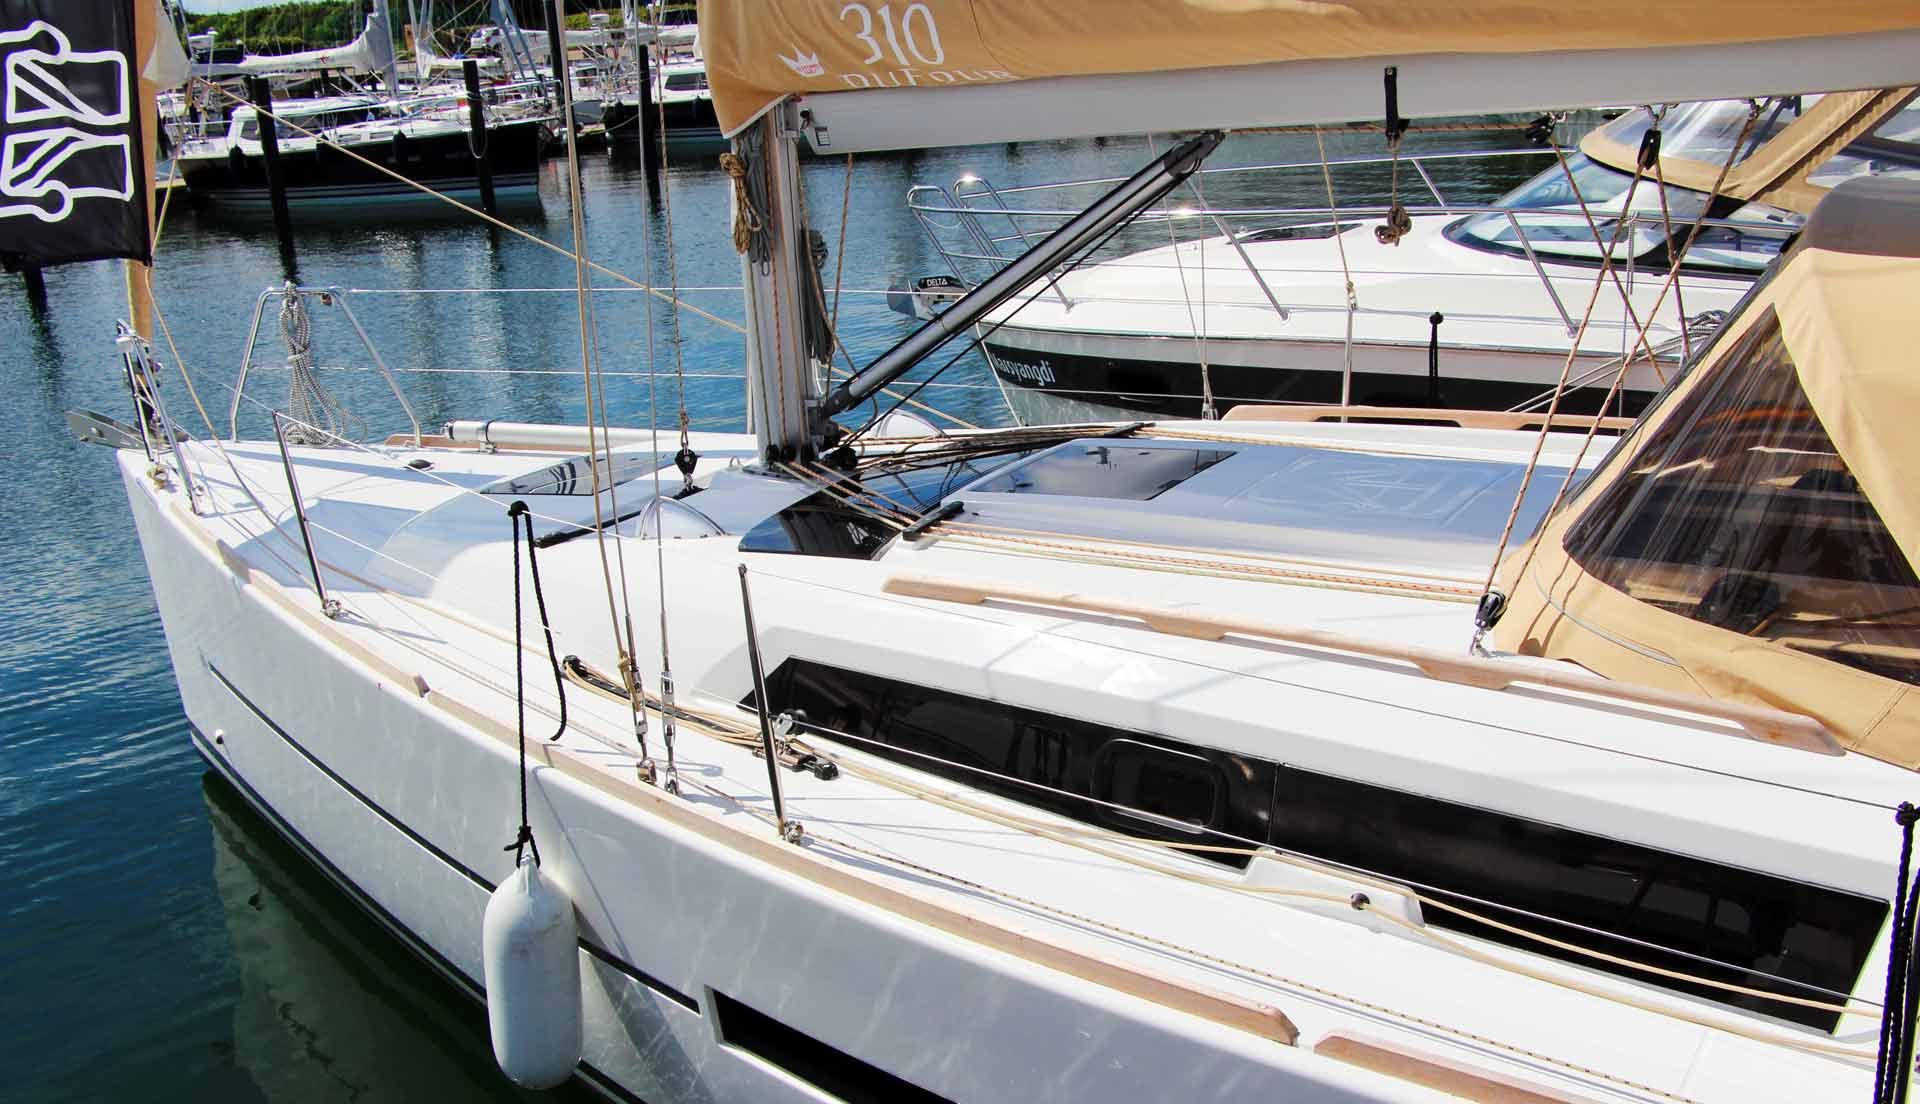 Modern and sleek lines by Umberto Felci Yacht Design